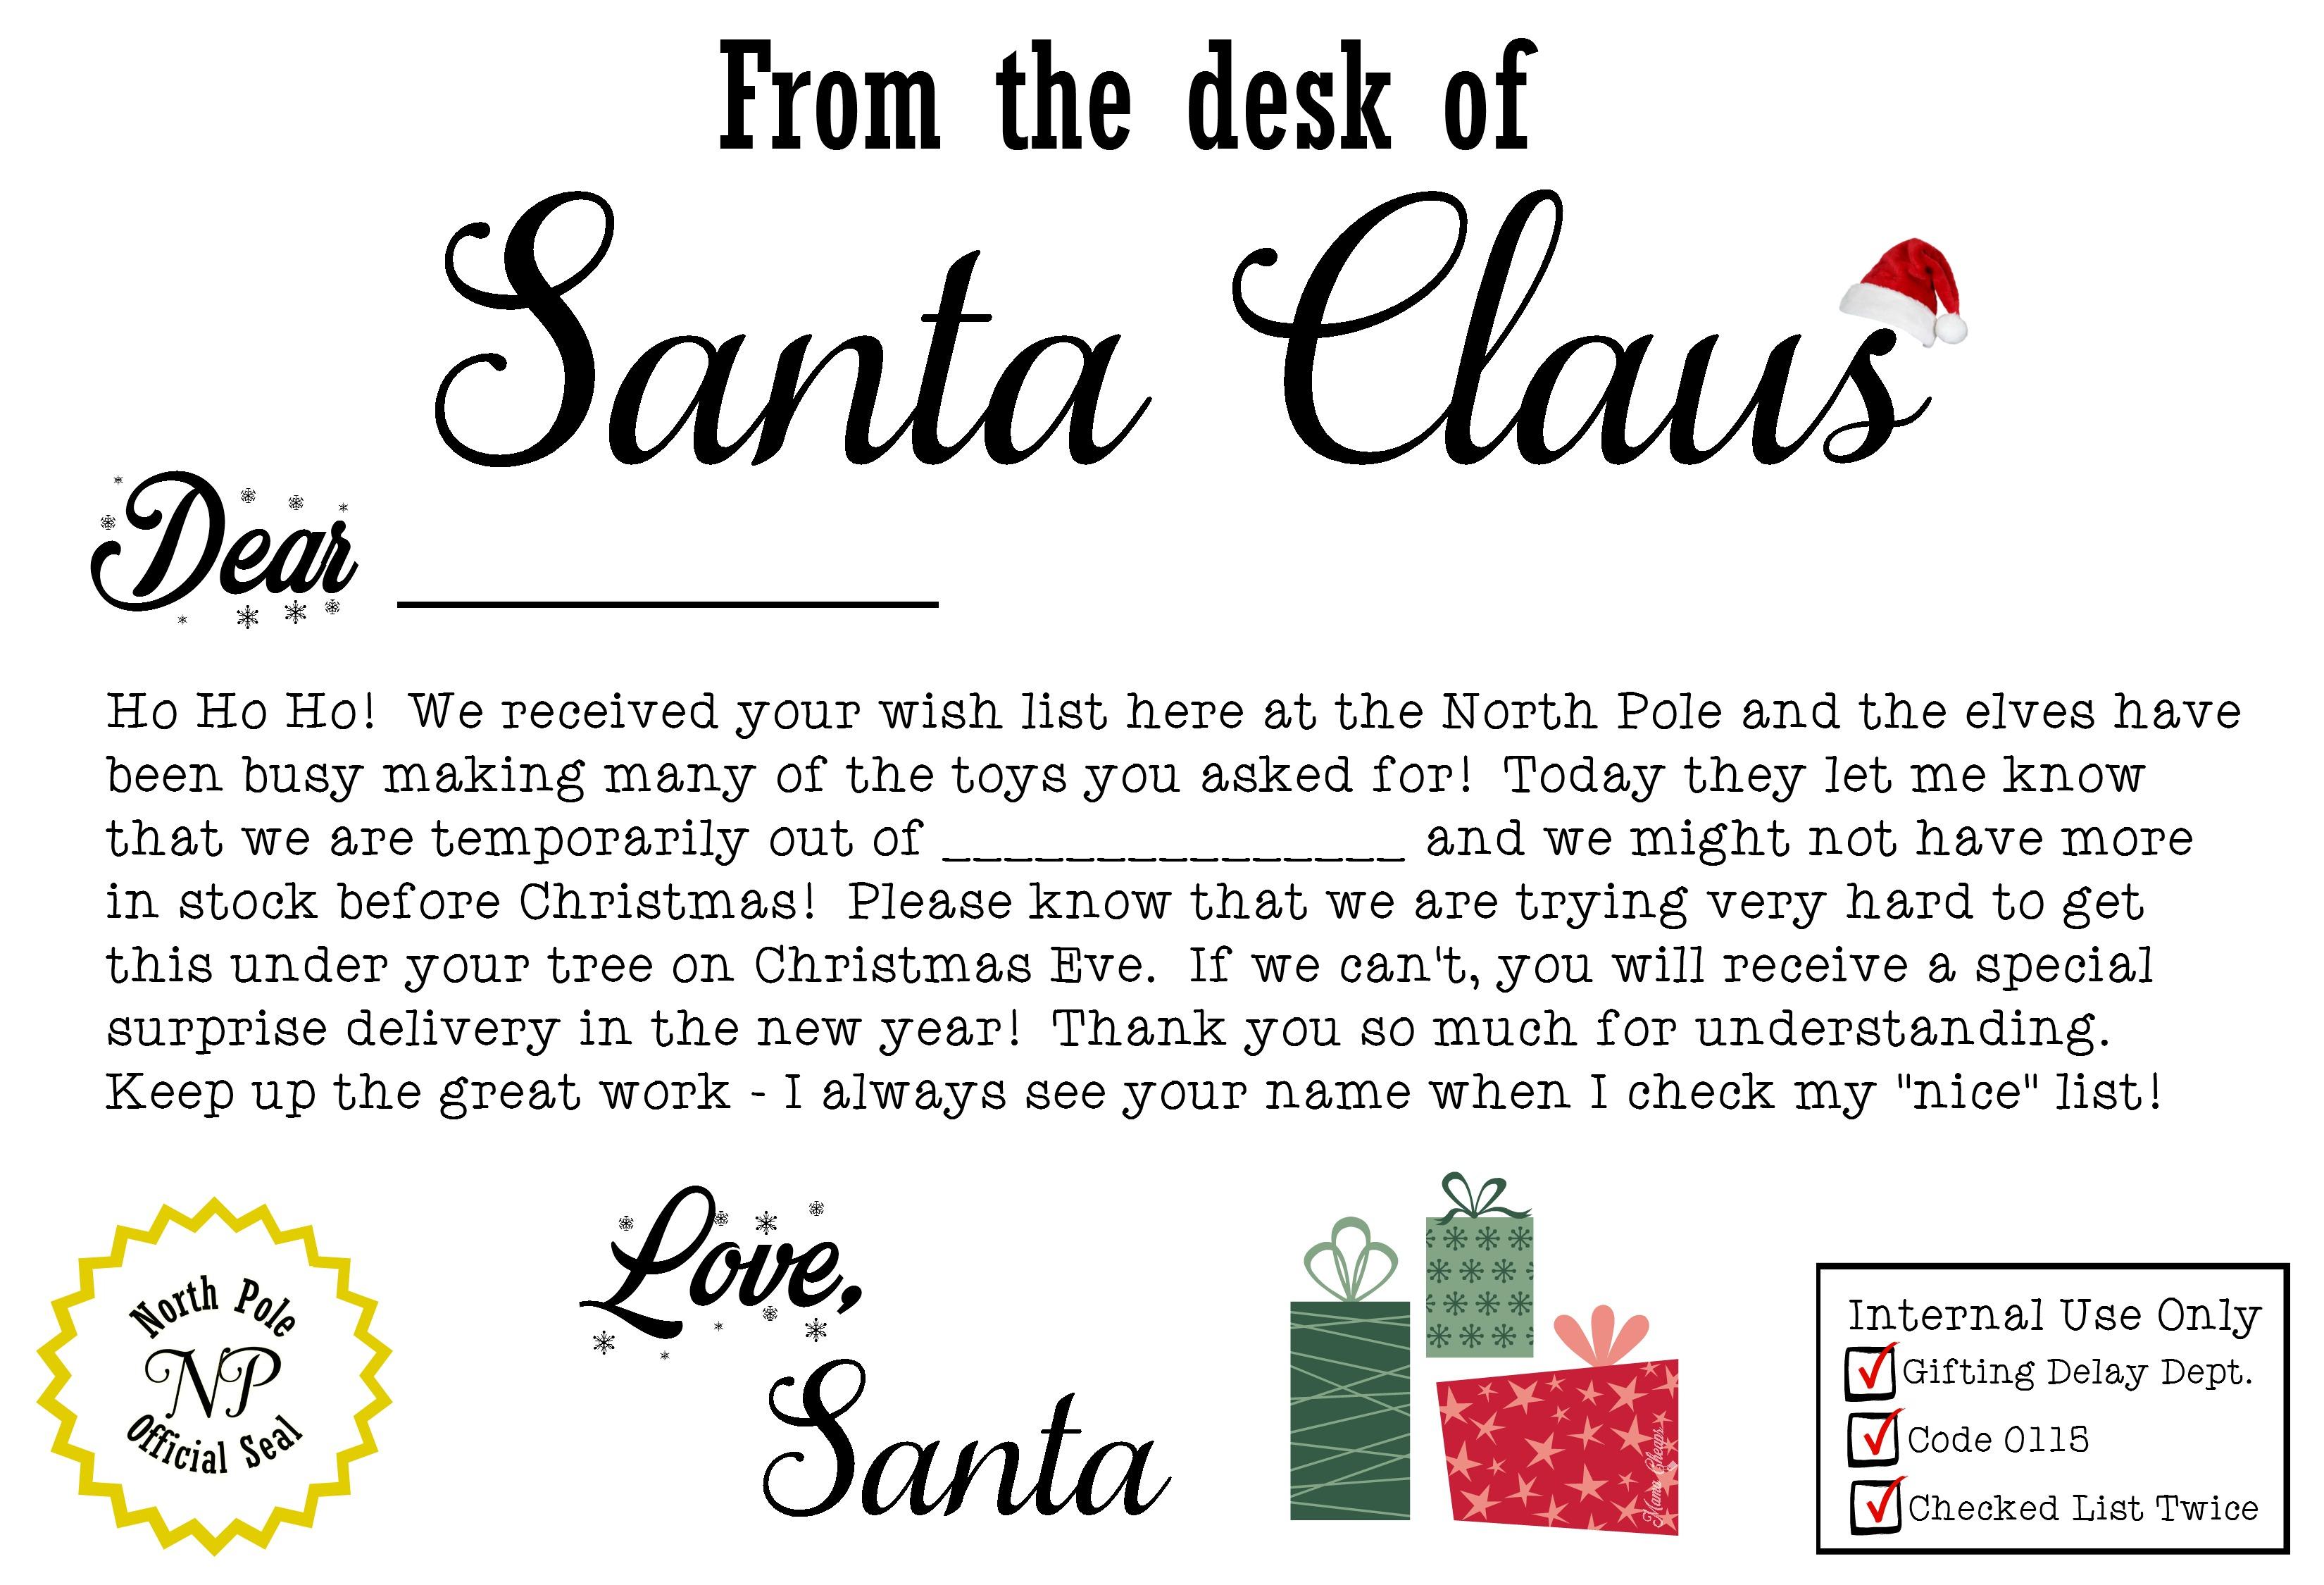 Free Santa Claus Christmas Present Iou Printable Letter   Mama Cheaps - Free Printable Christmas Letters From Santa